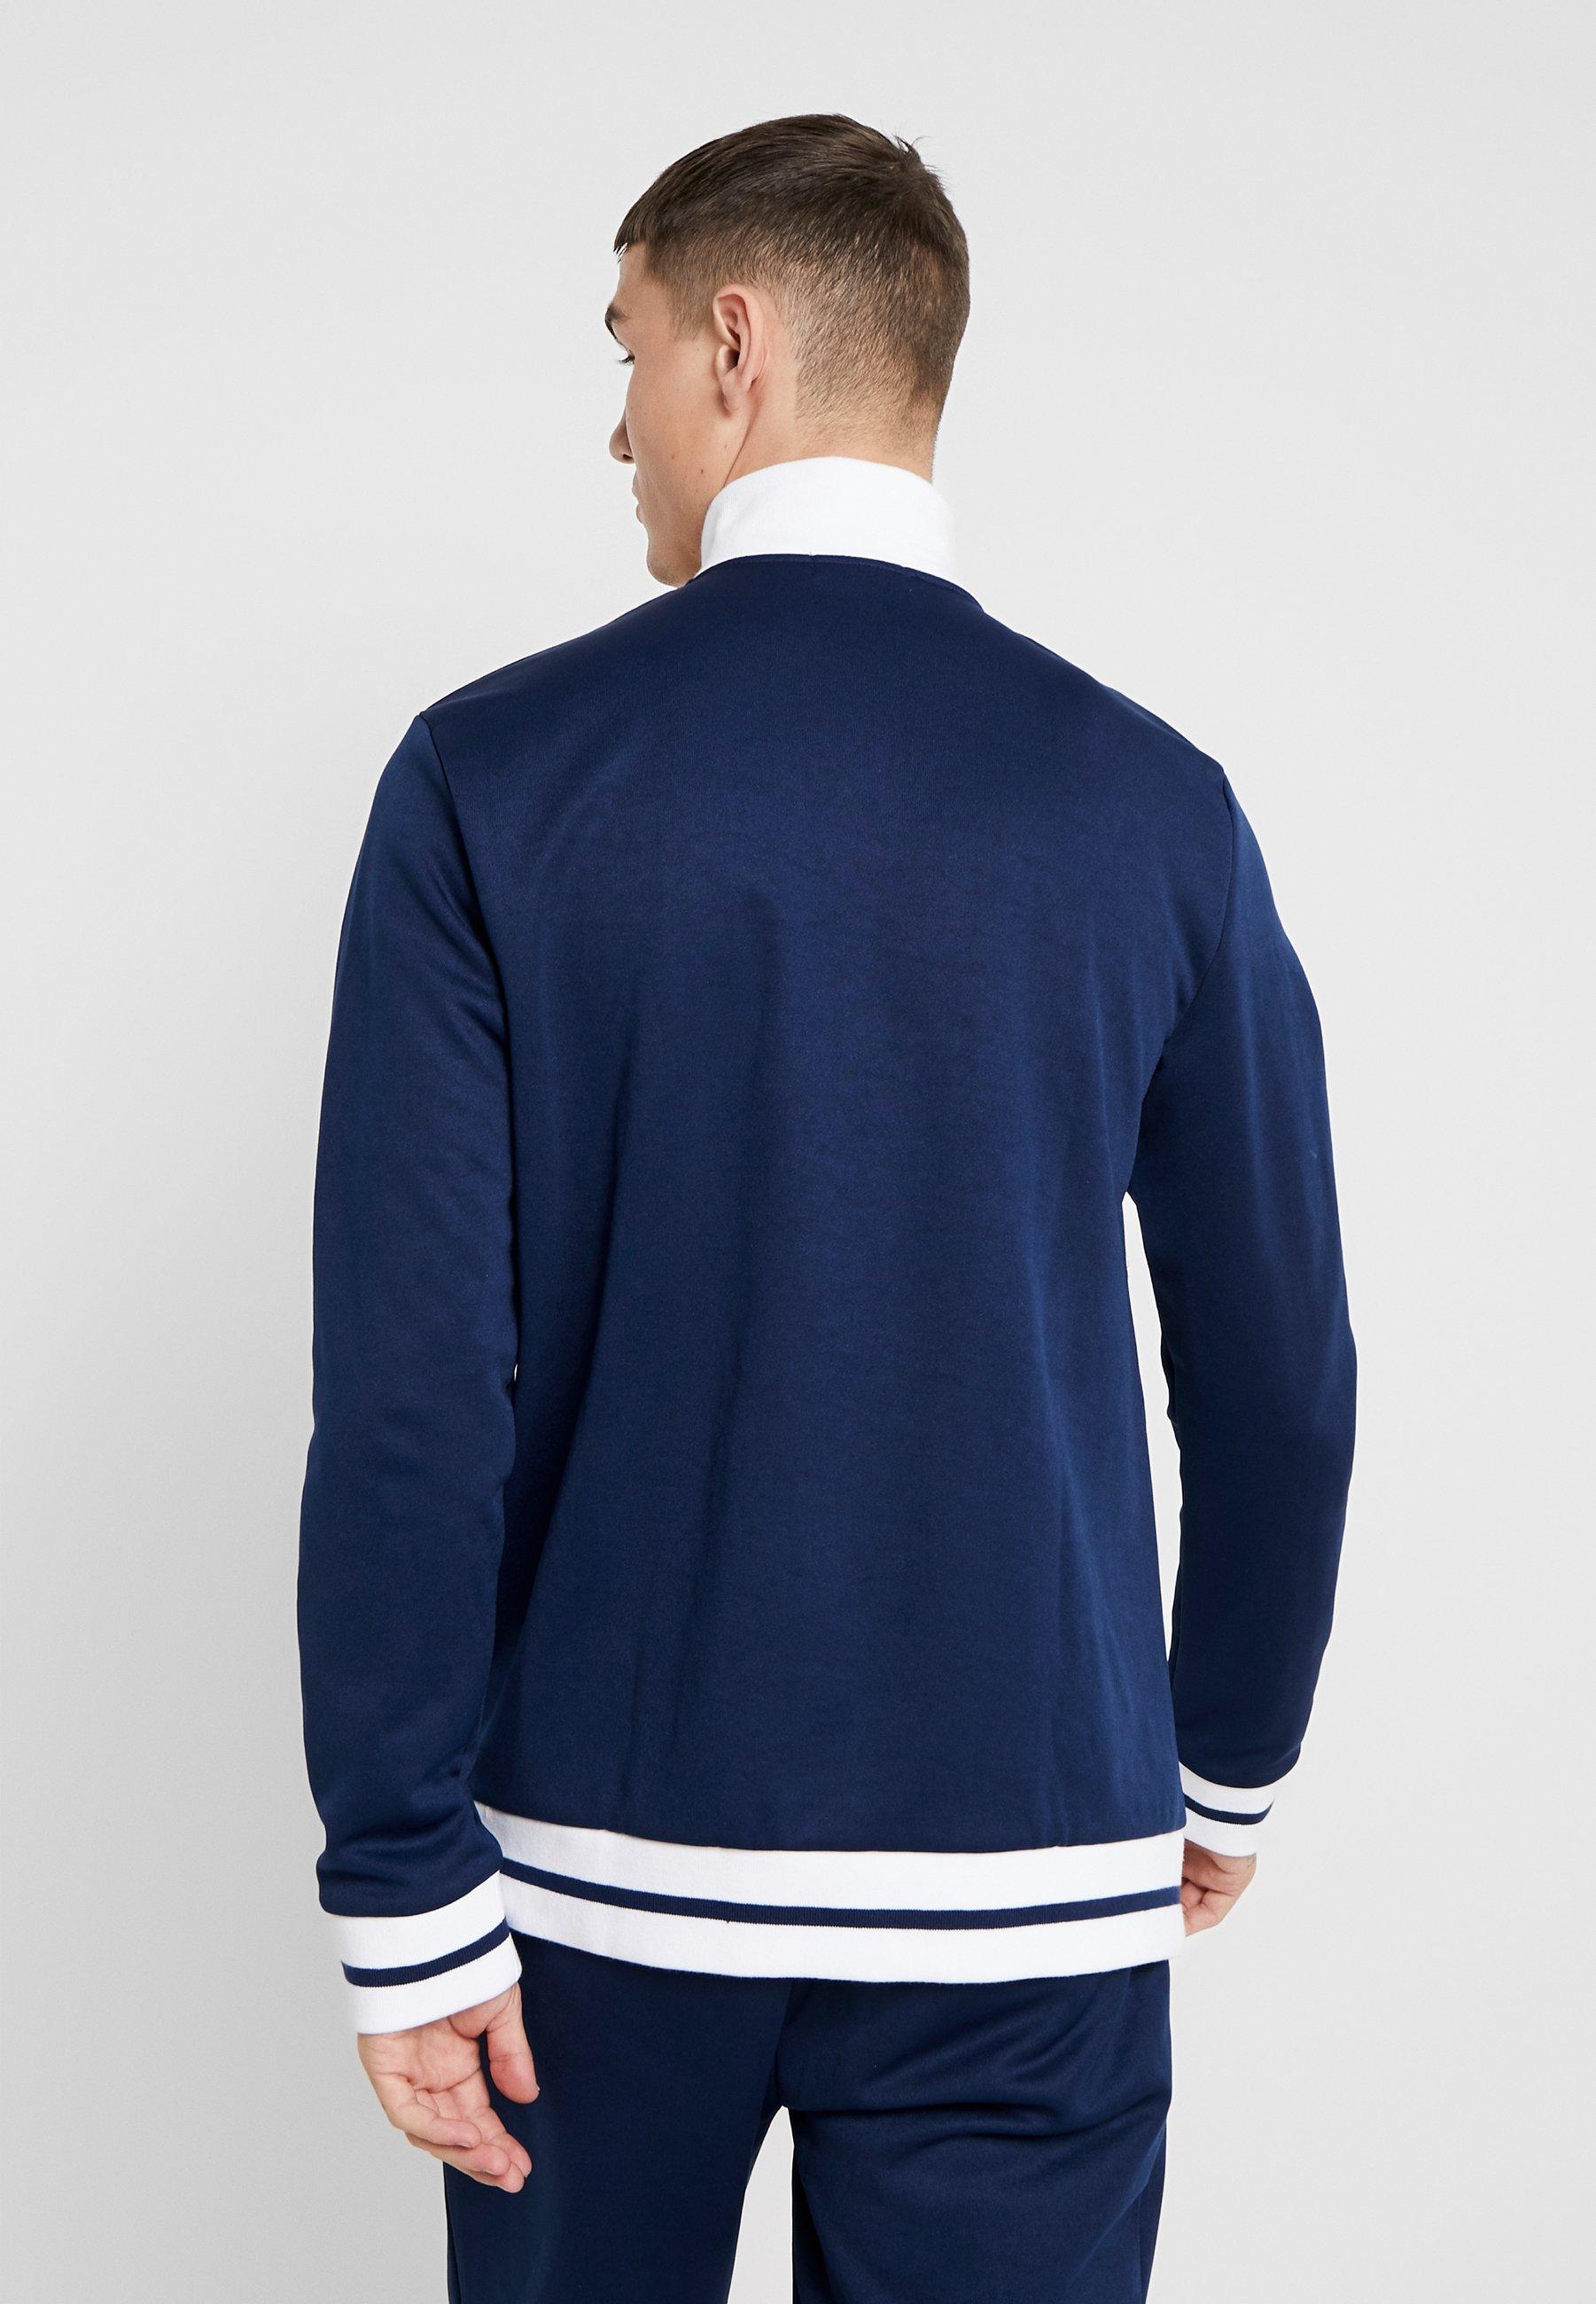 TrackSweatshirt Navy Topman TrackSweatshirt Navy Trico Topman Topman TrackSweatshirt Topman Trico Navy Trico v0wNnmO8